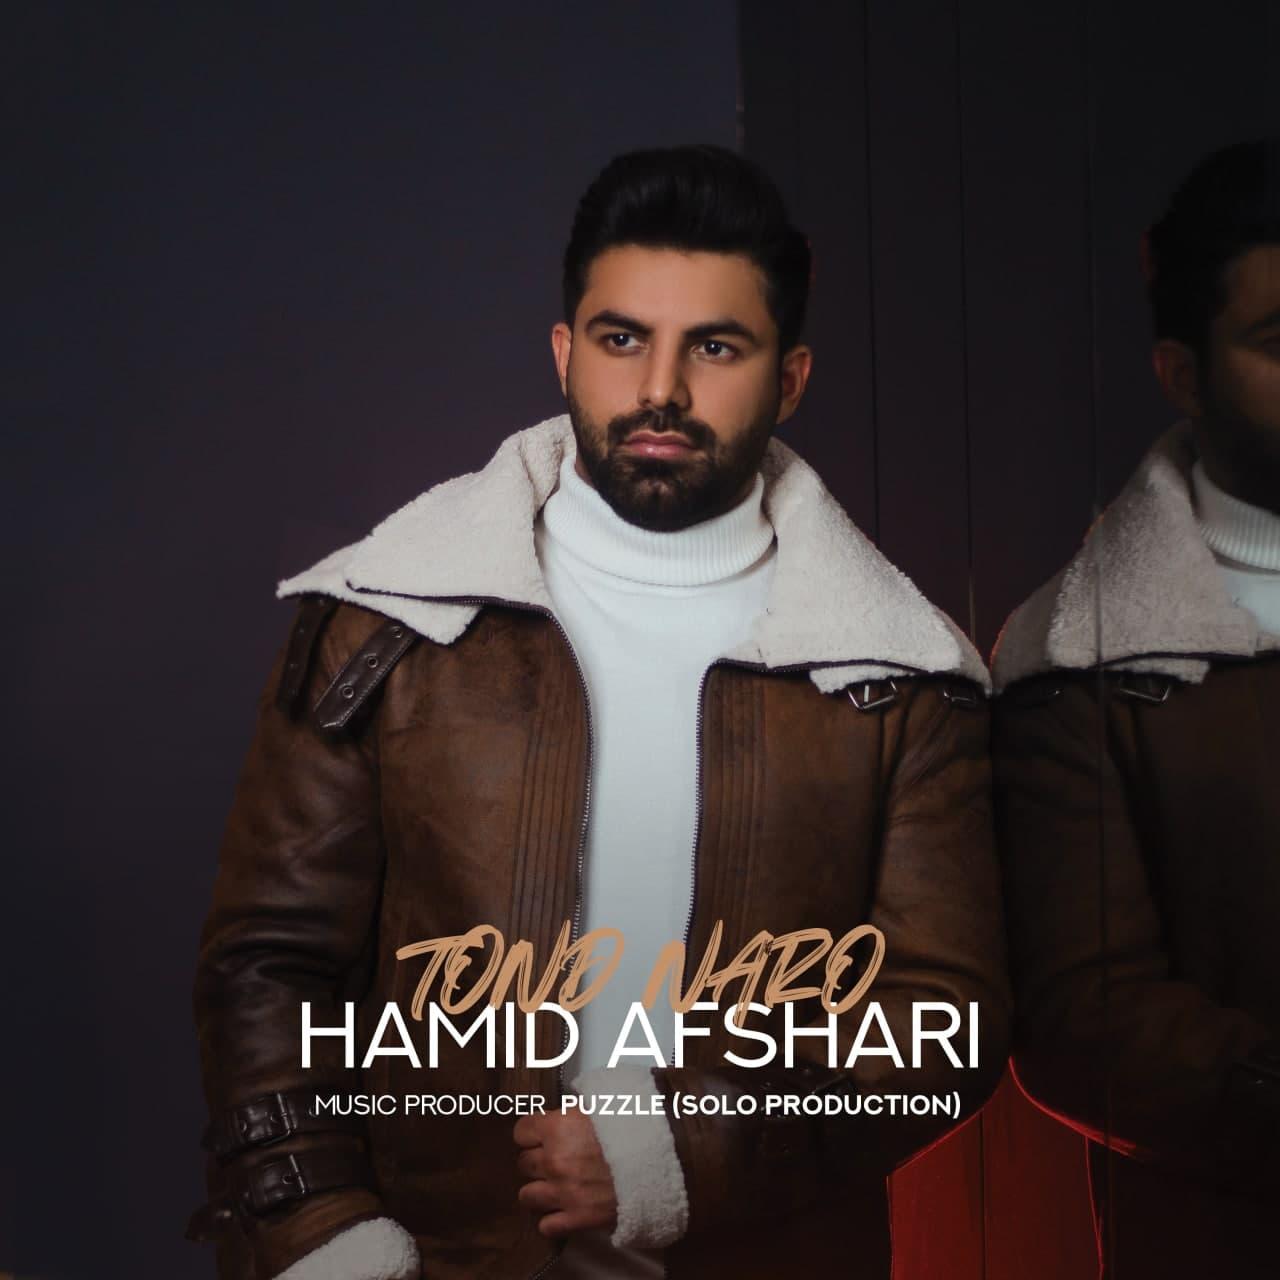 Hamid Afshari – Tond Naro